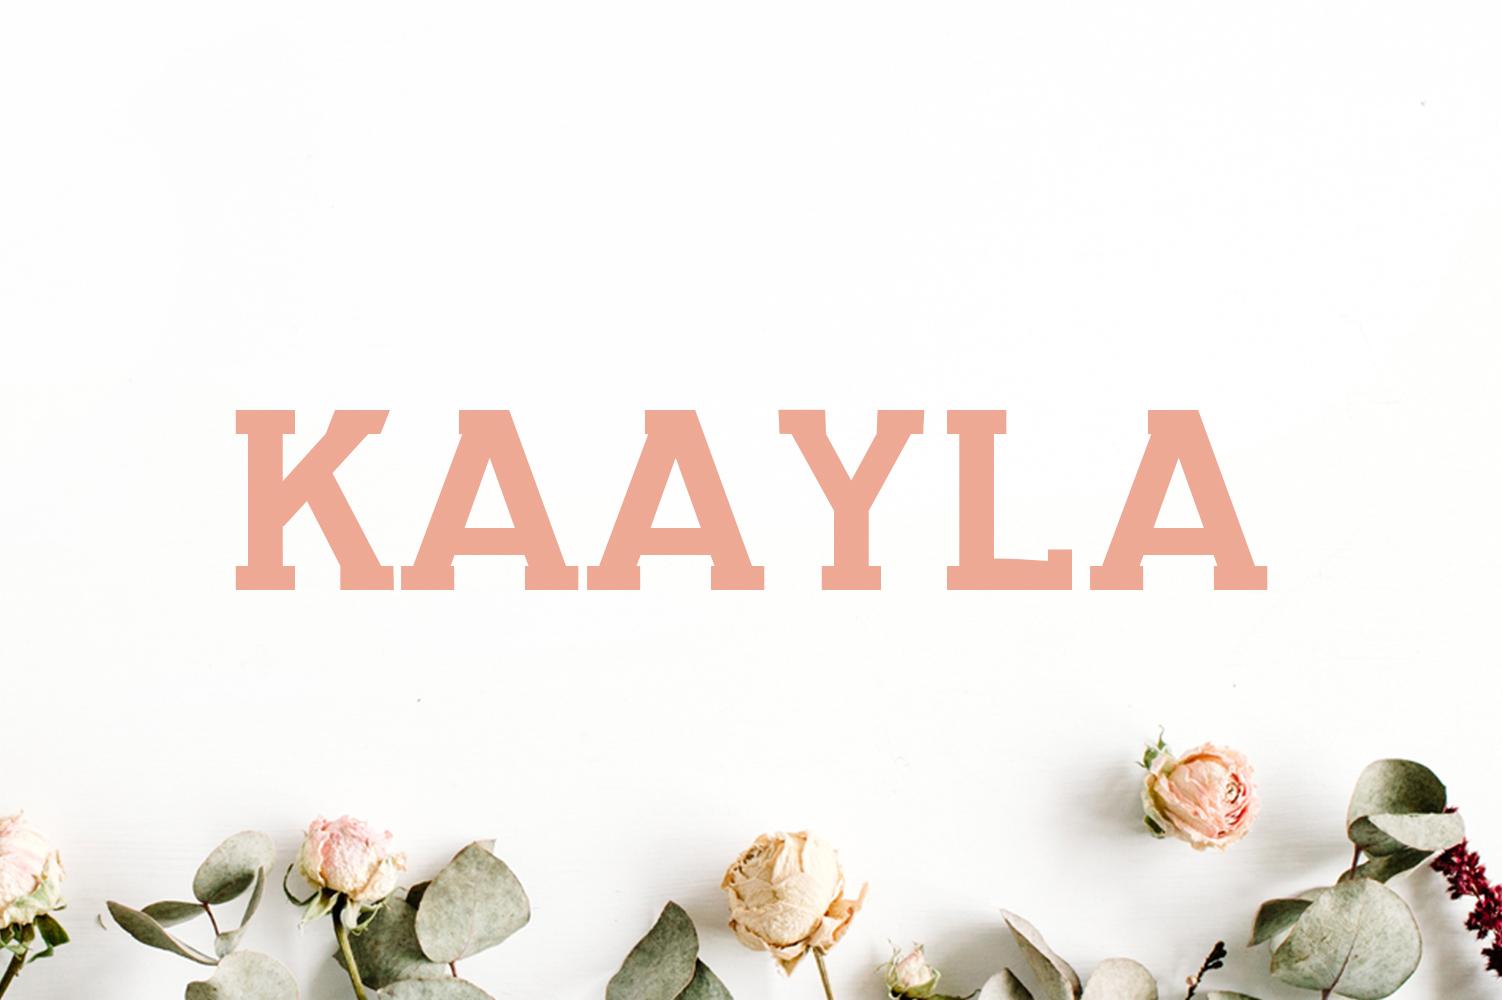 Kaayla Slab Serif 4 Font Pack example image 1